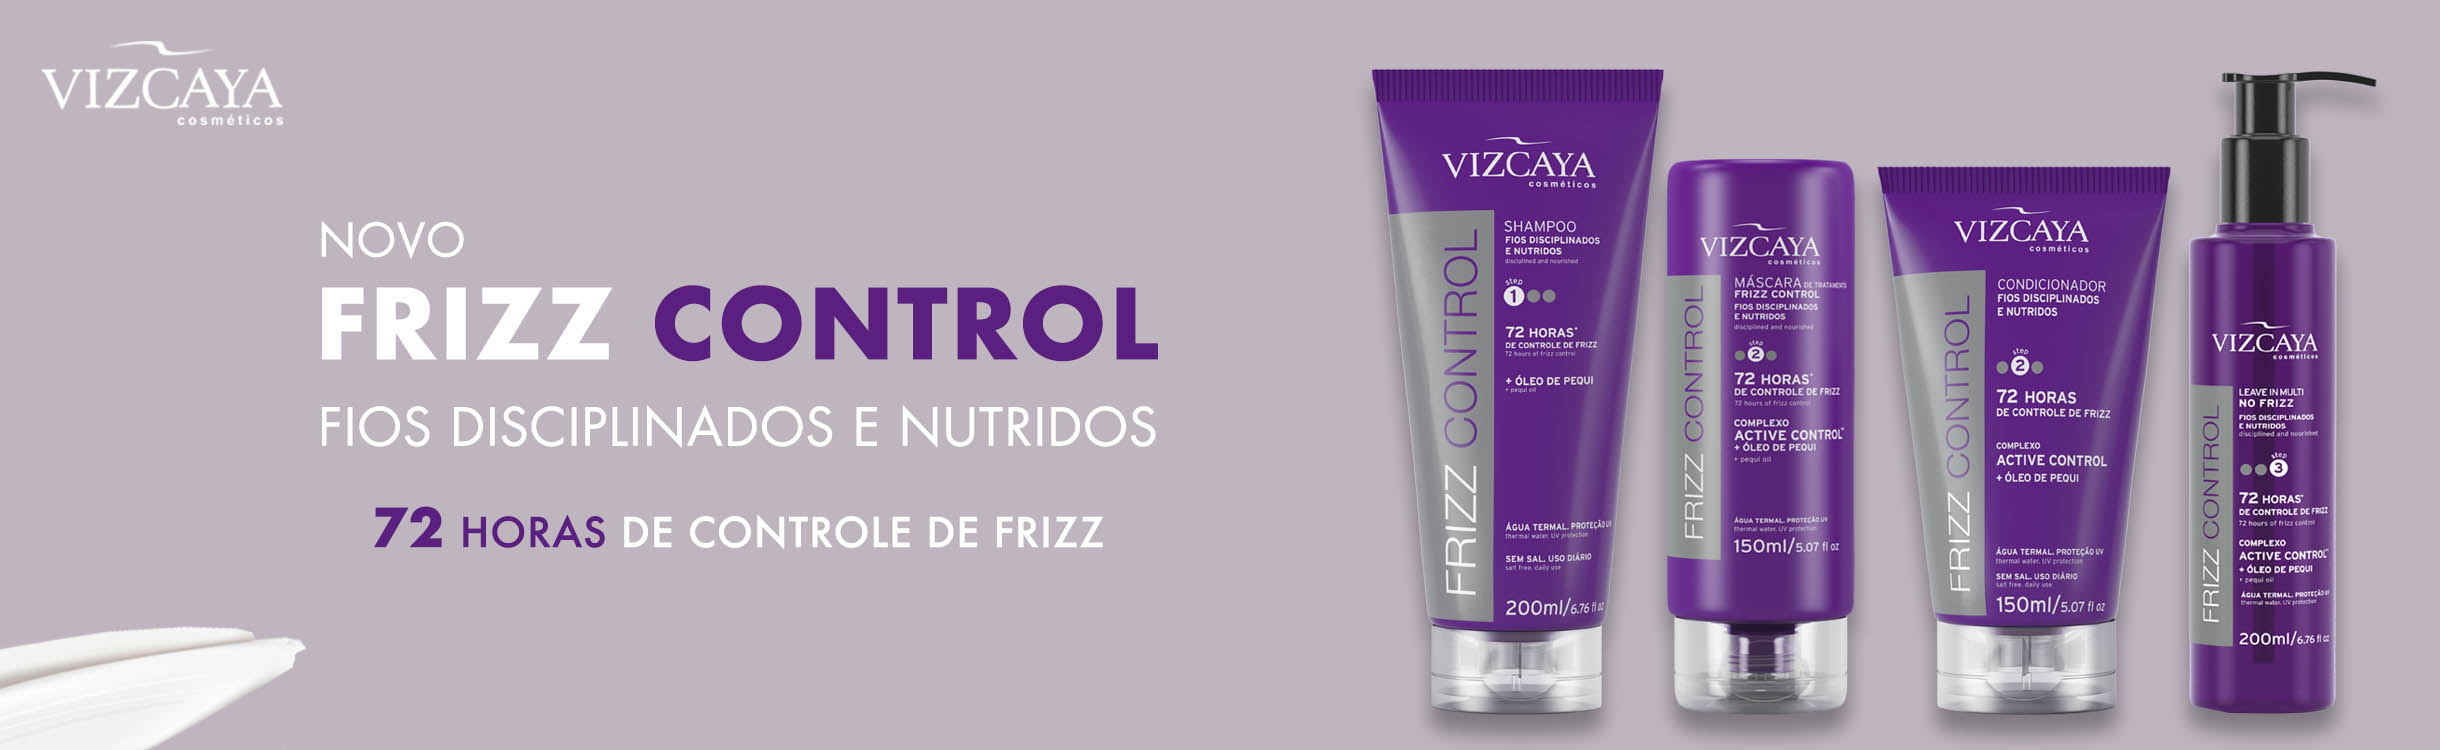 Vizcaya Frizz Control